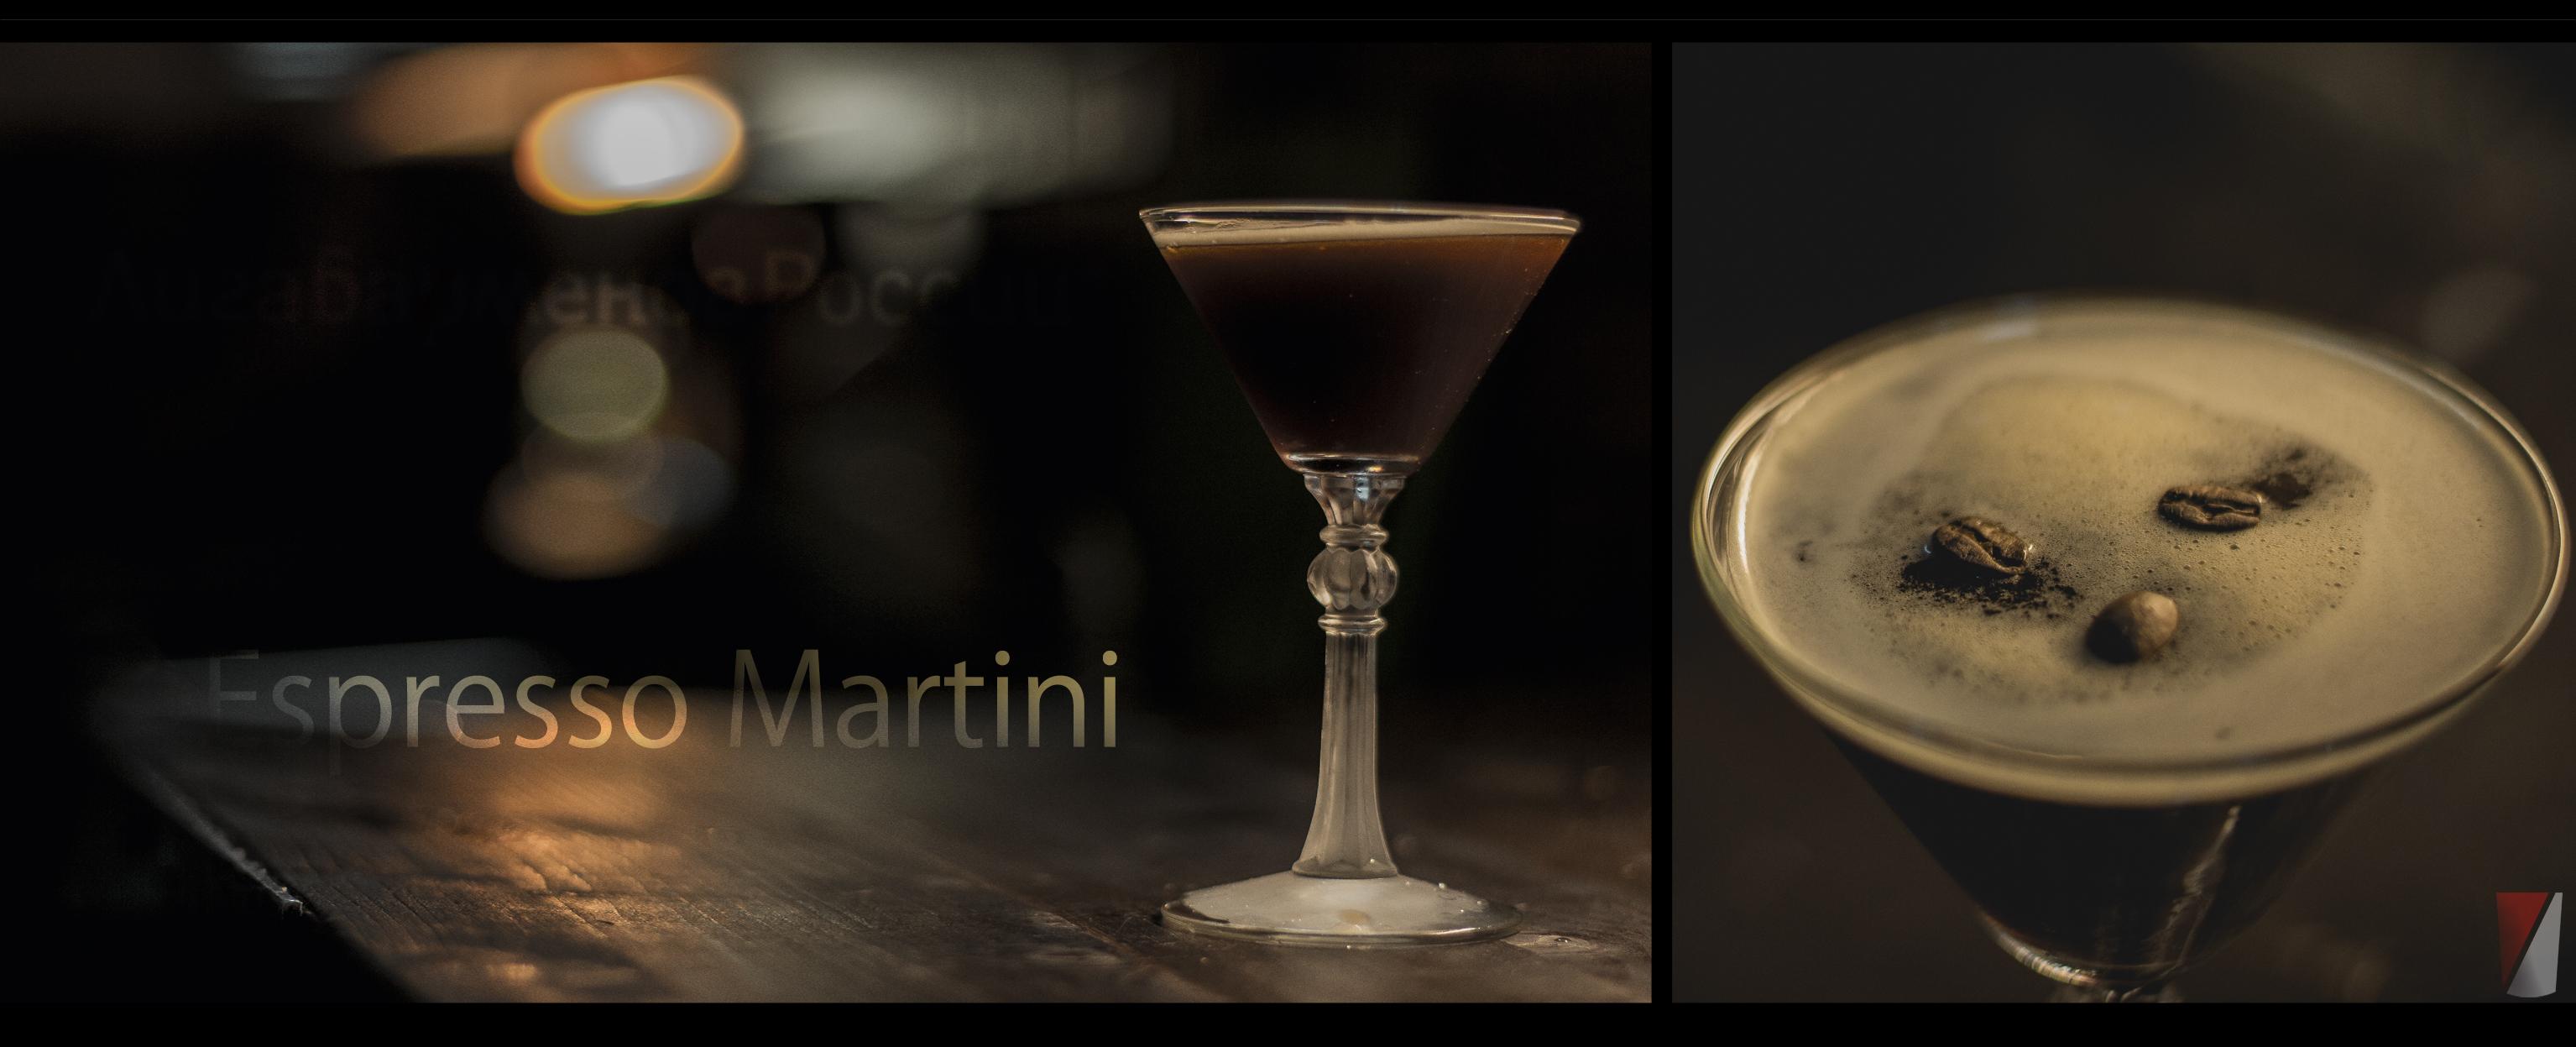 Рецепт коктейля Espresso Martini